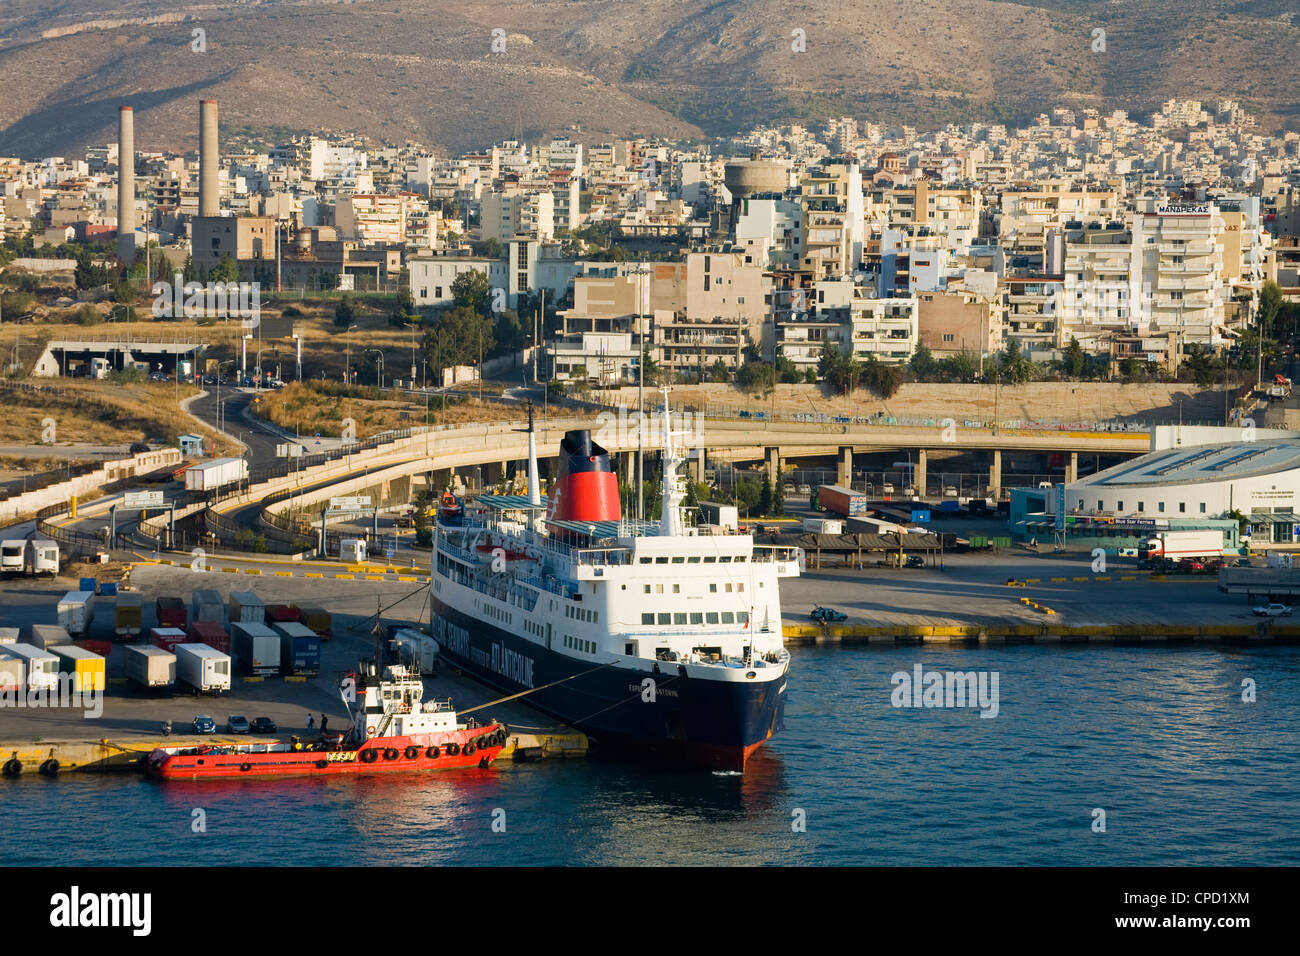 Ferry in Port of Piraeus, Athens, Greece, Europe - Stock Image